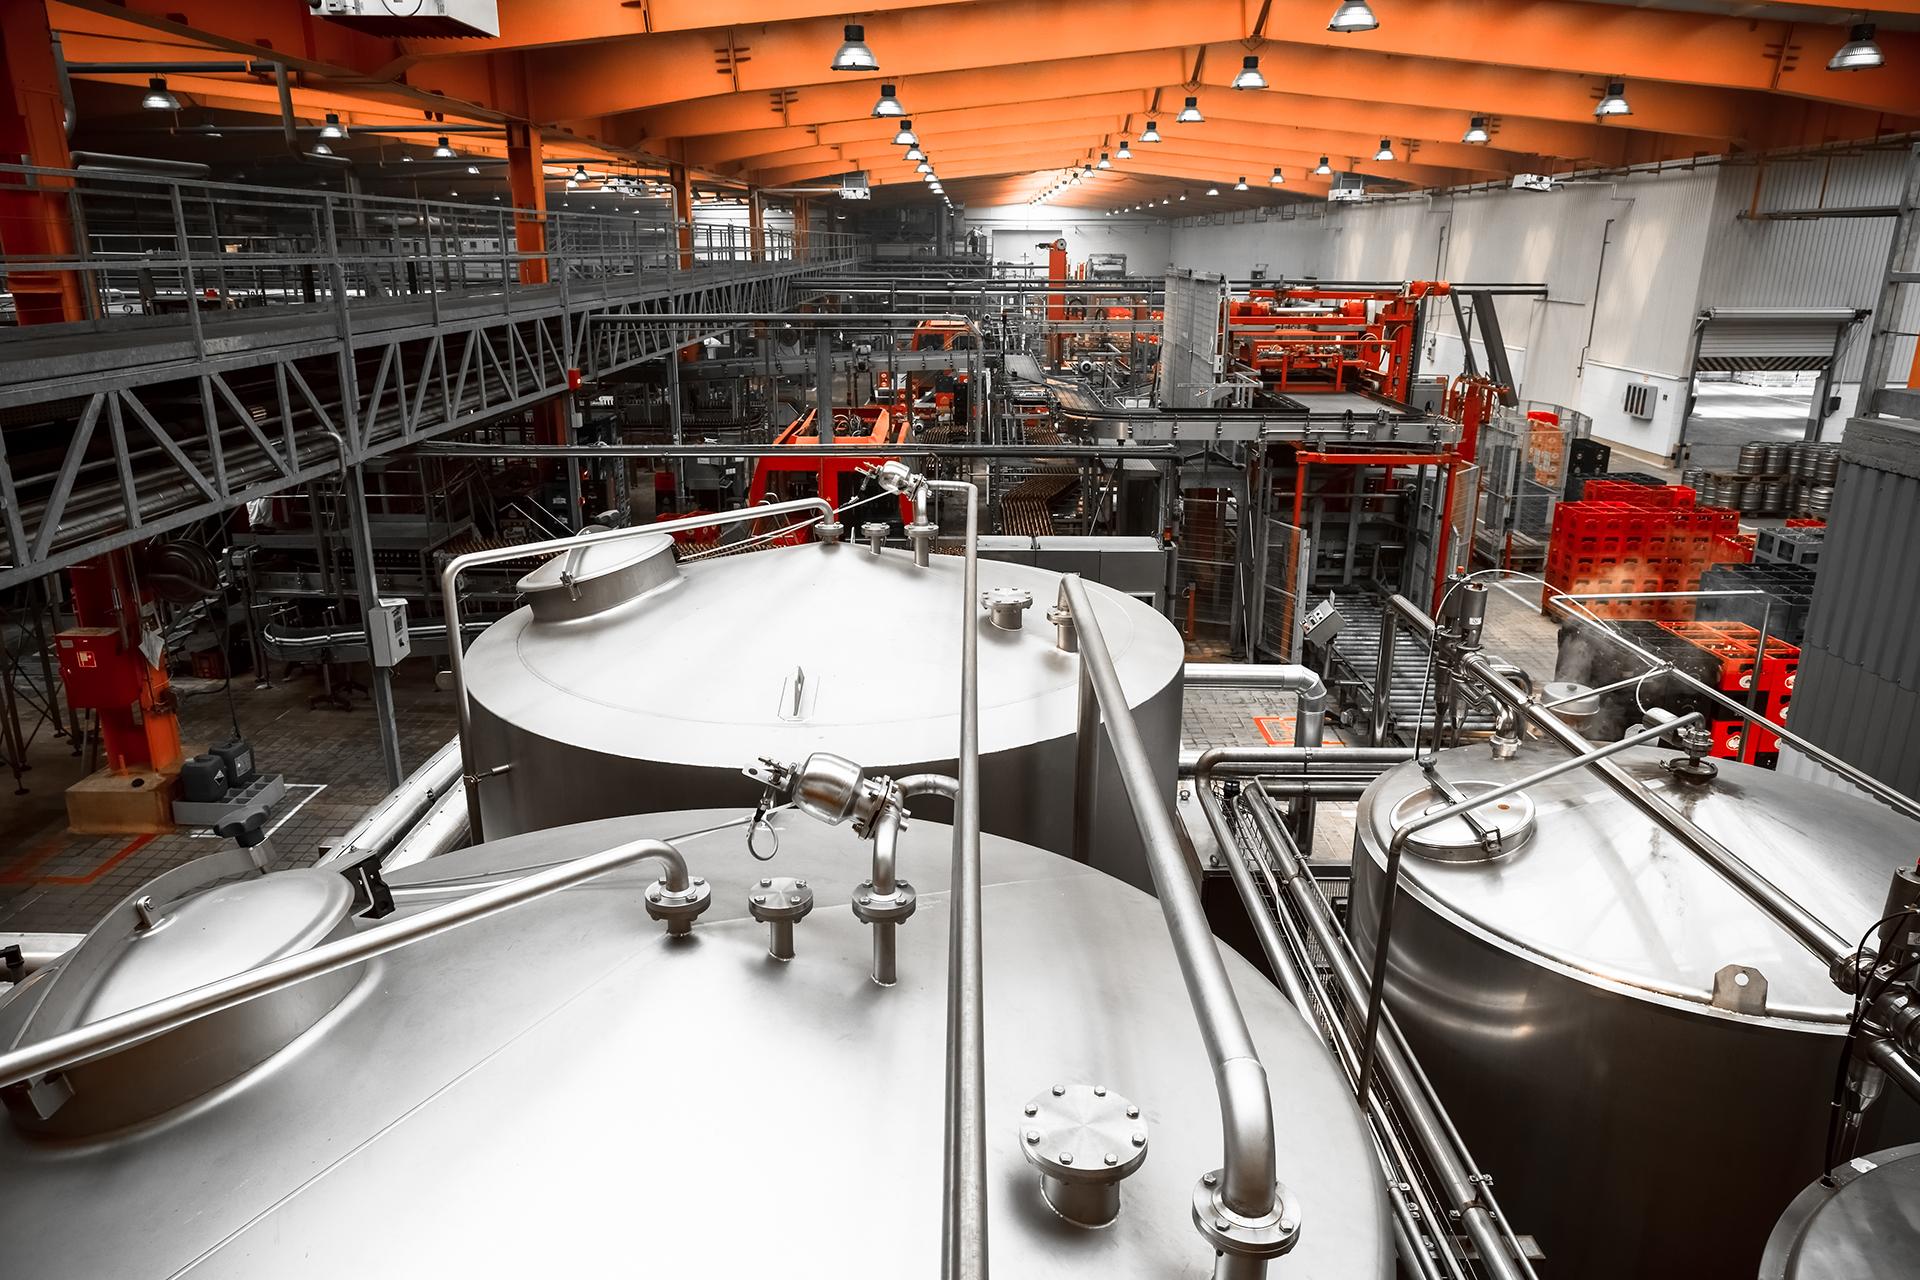 breweries evolving